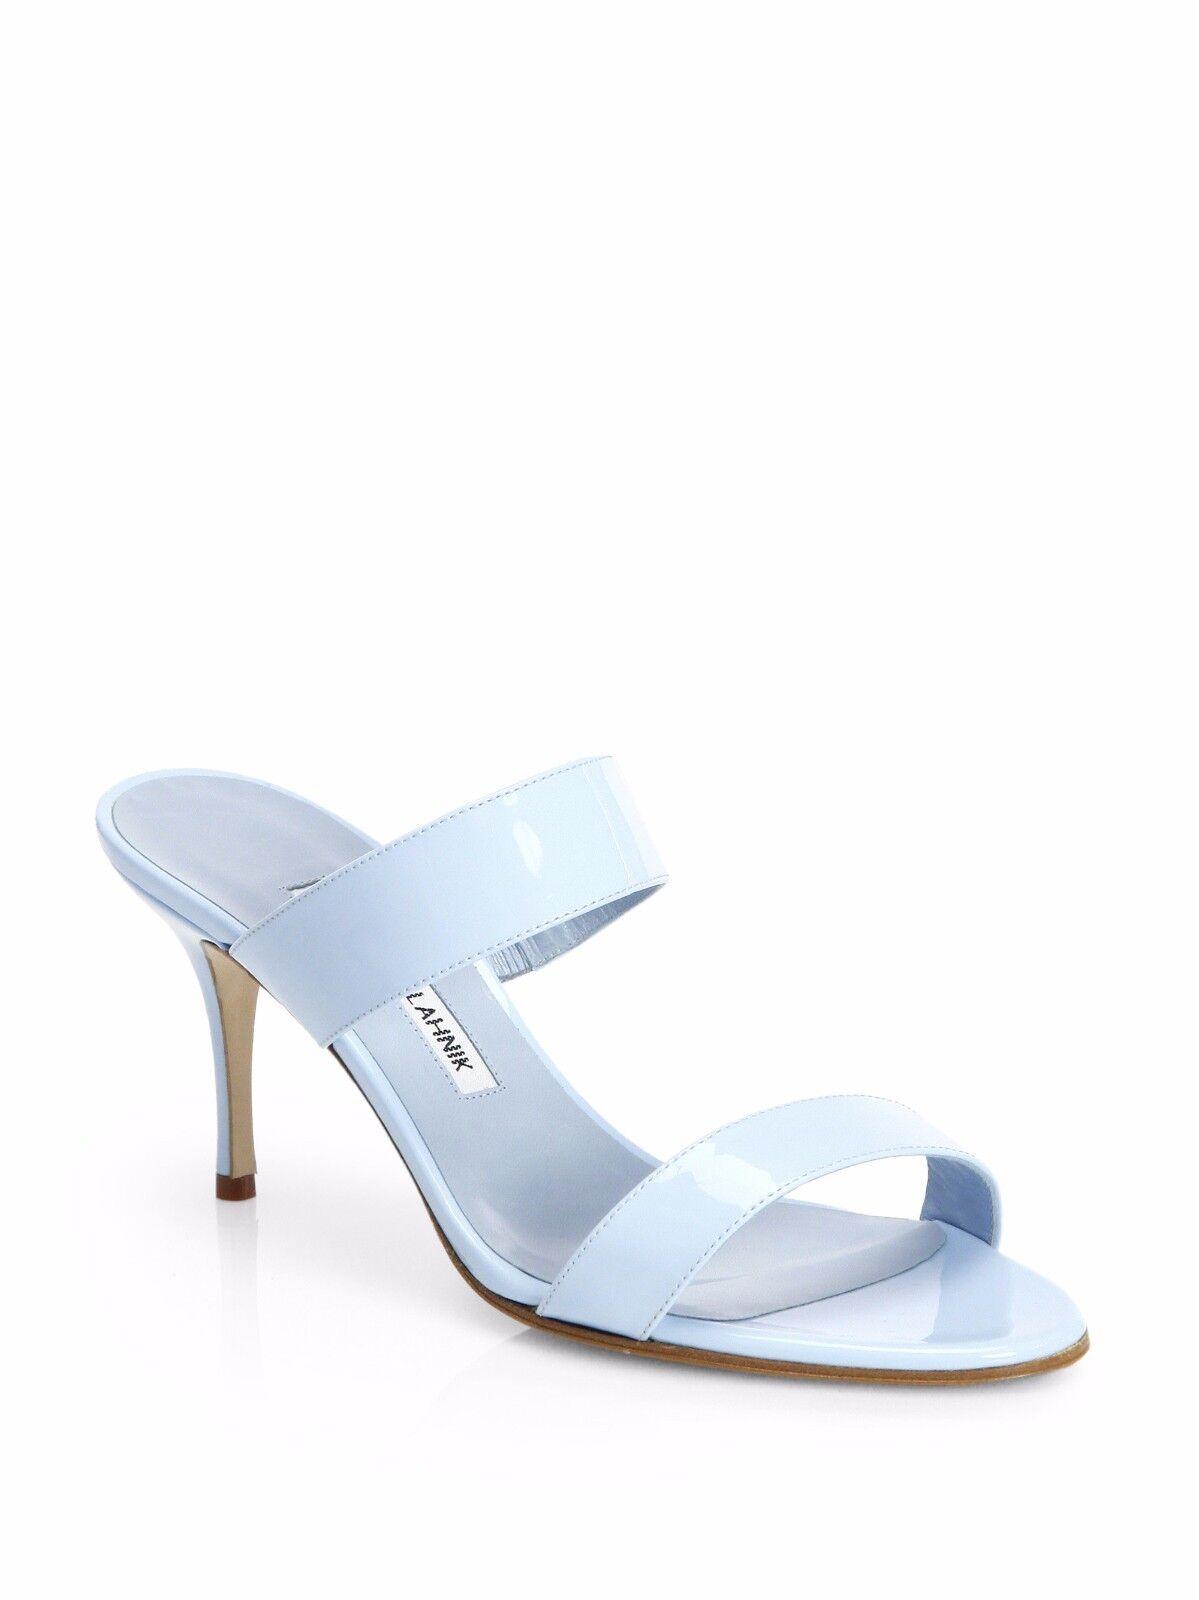 Neu Manolo Blahnik Angufac Hellblau Lackleder Sandalen Rutschen Schuhe 37.5